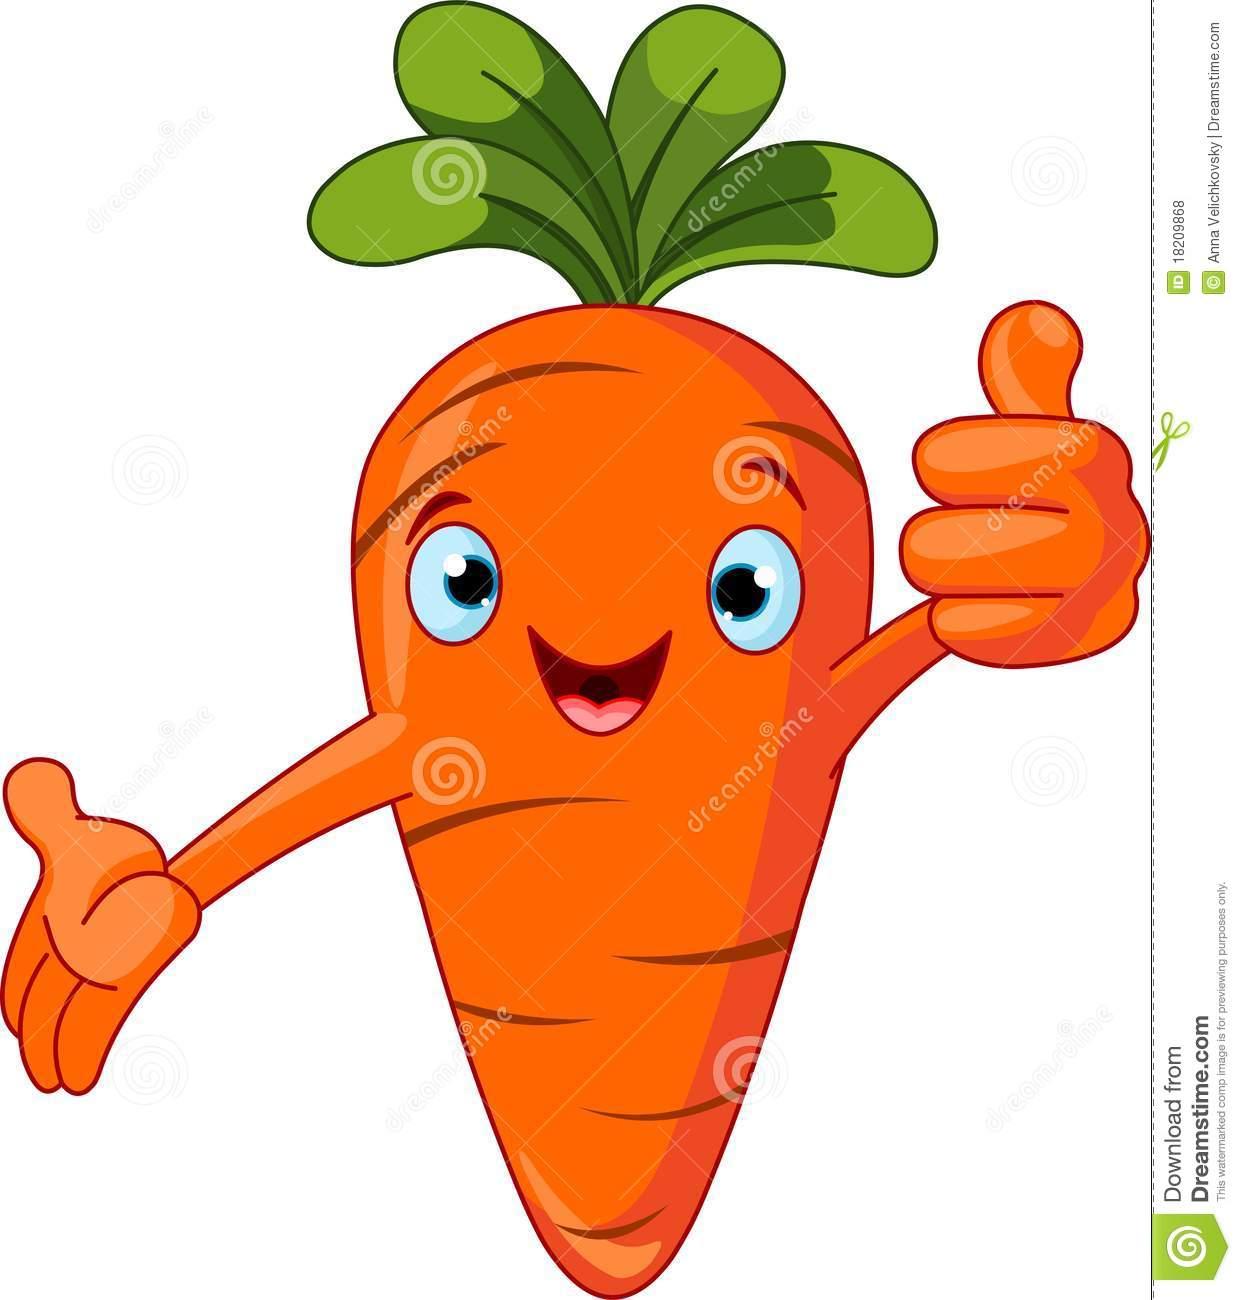 clip art cartoon vegetables - photo #4